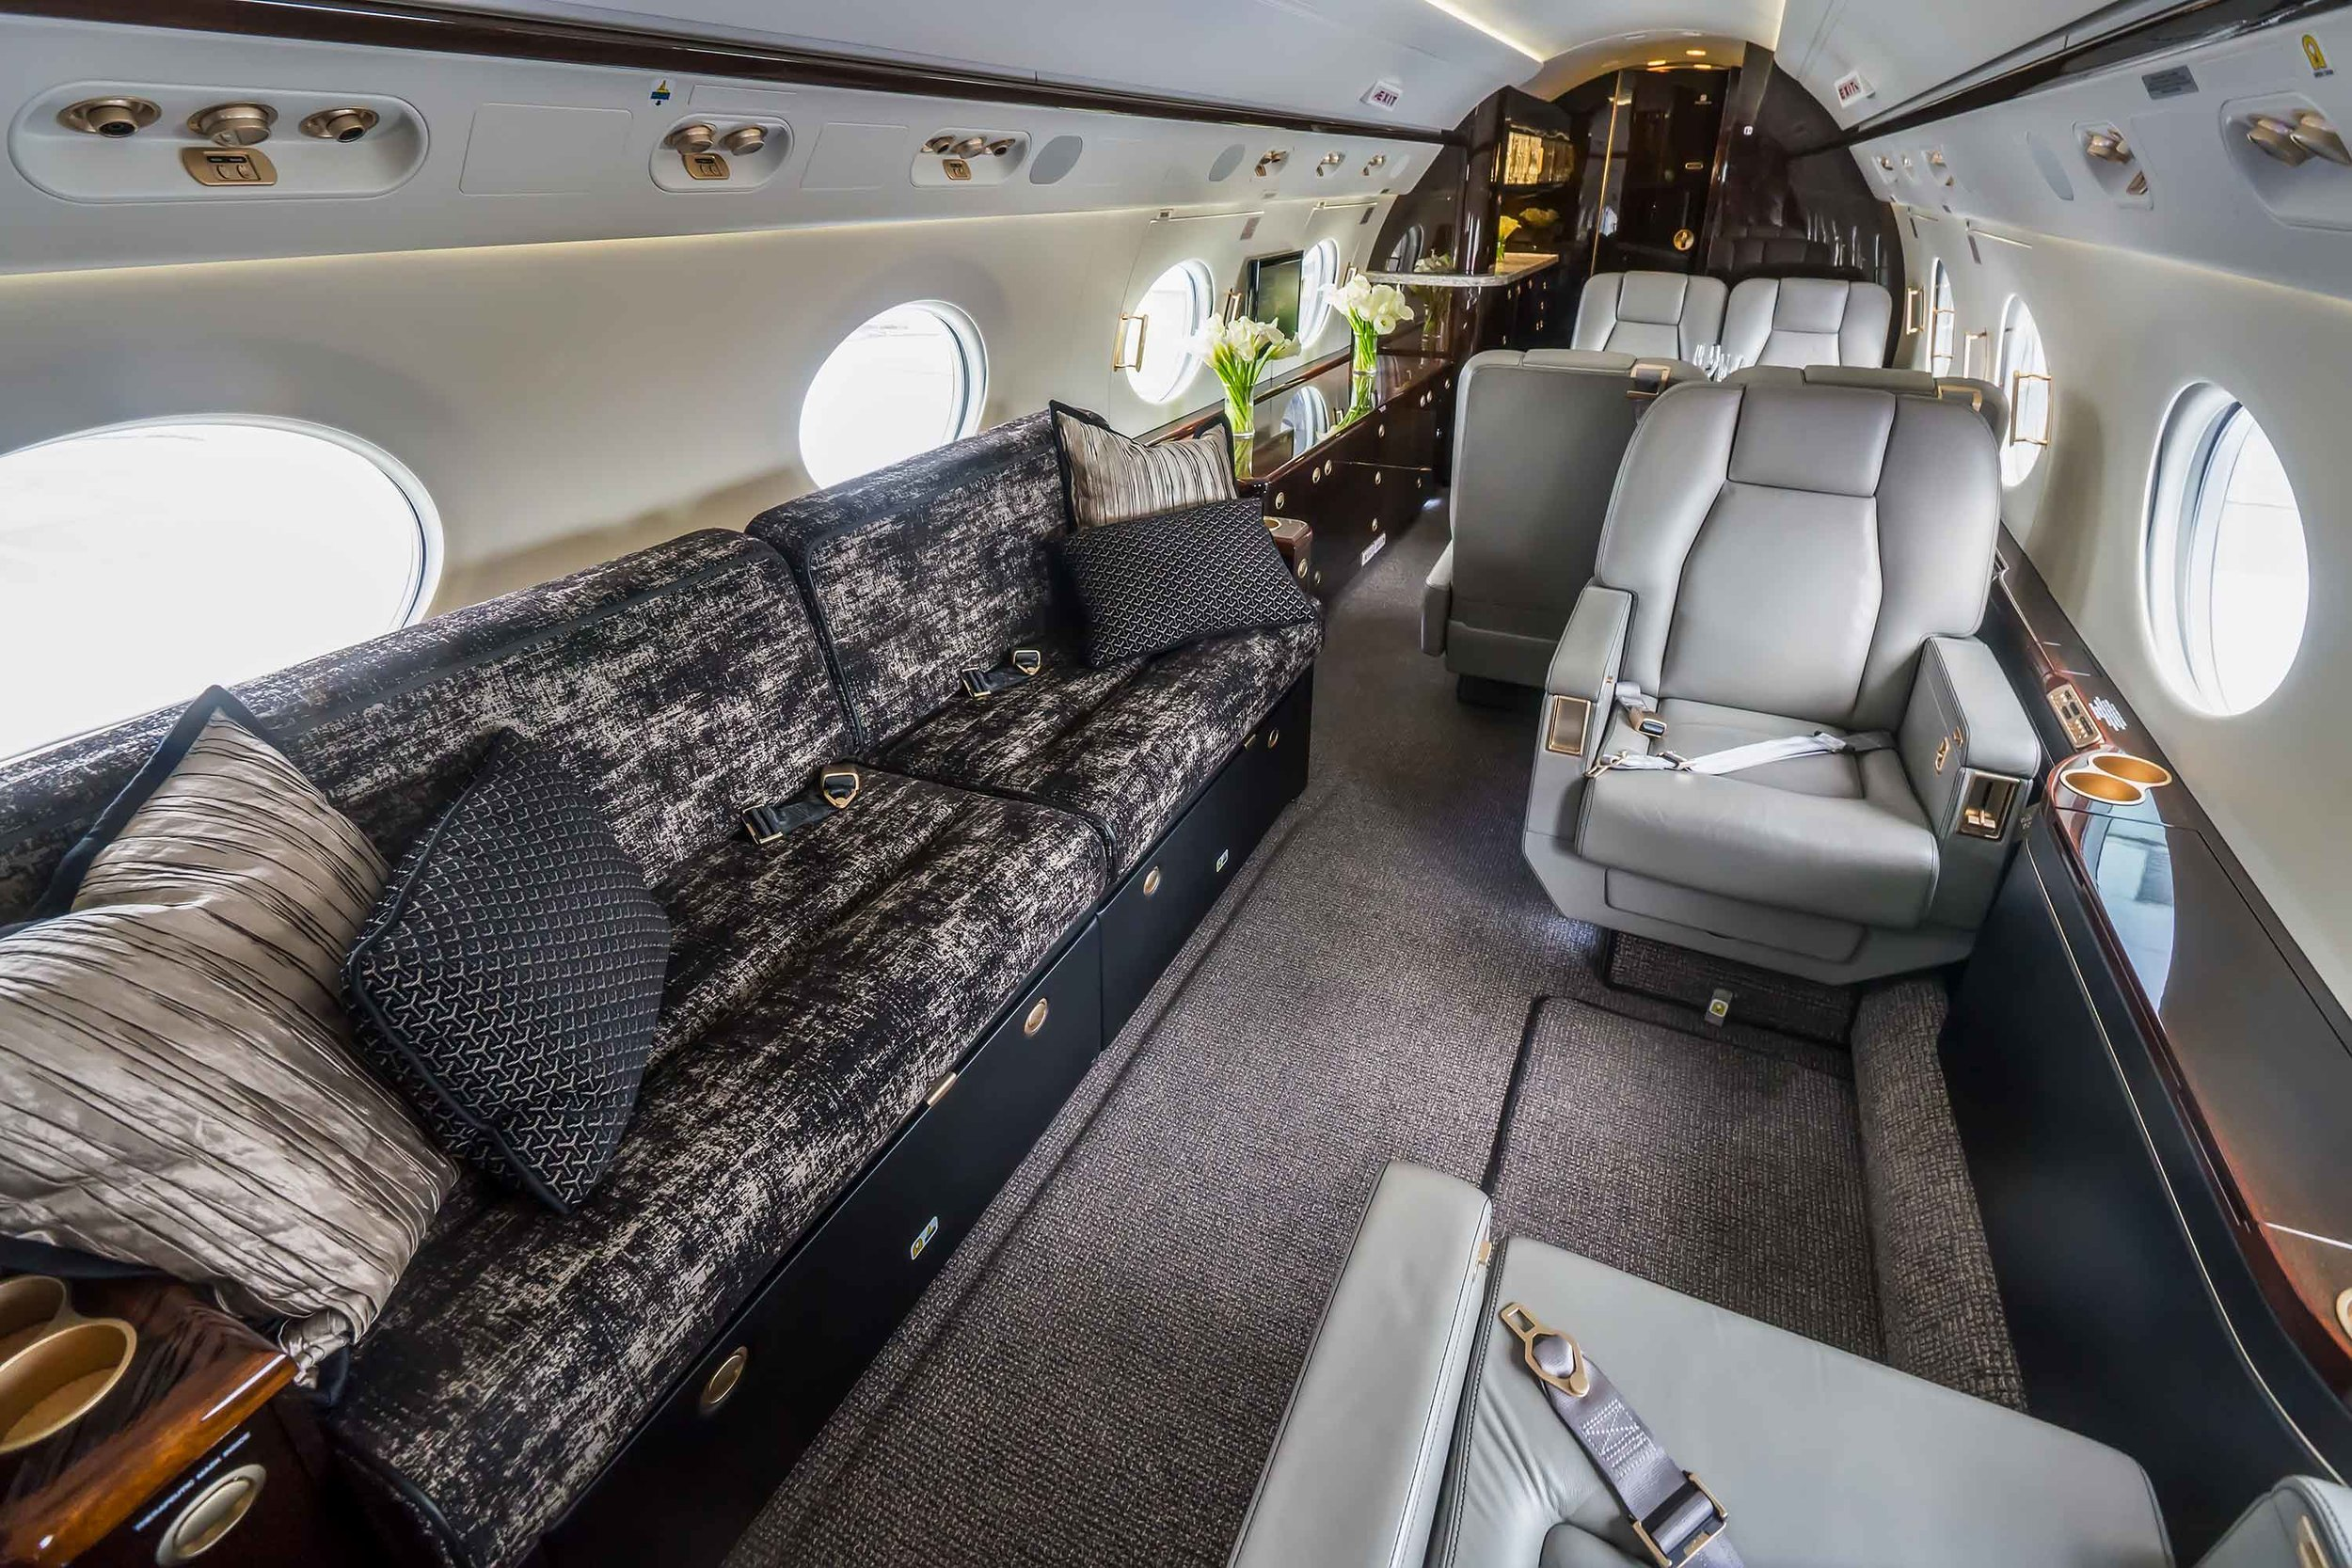 aviation,-funfrock,-canapé,-gainage,-coussin,-avion,-business-jet.jpg